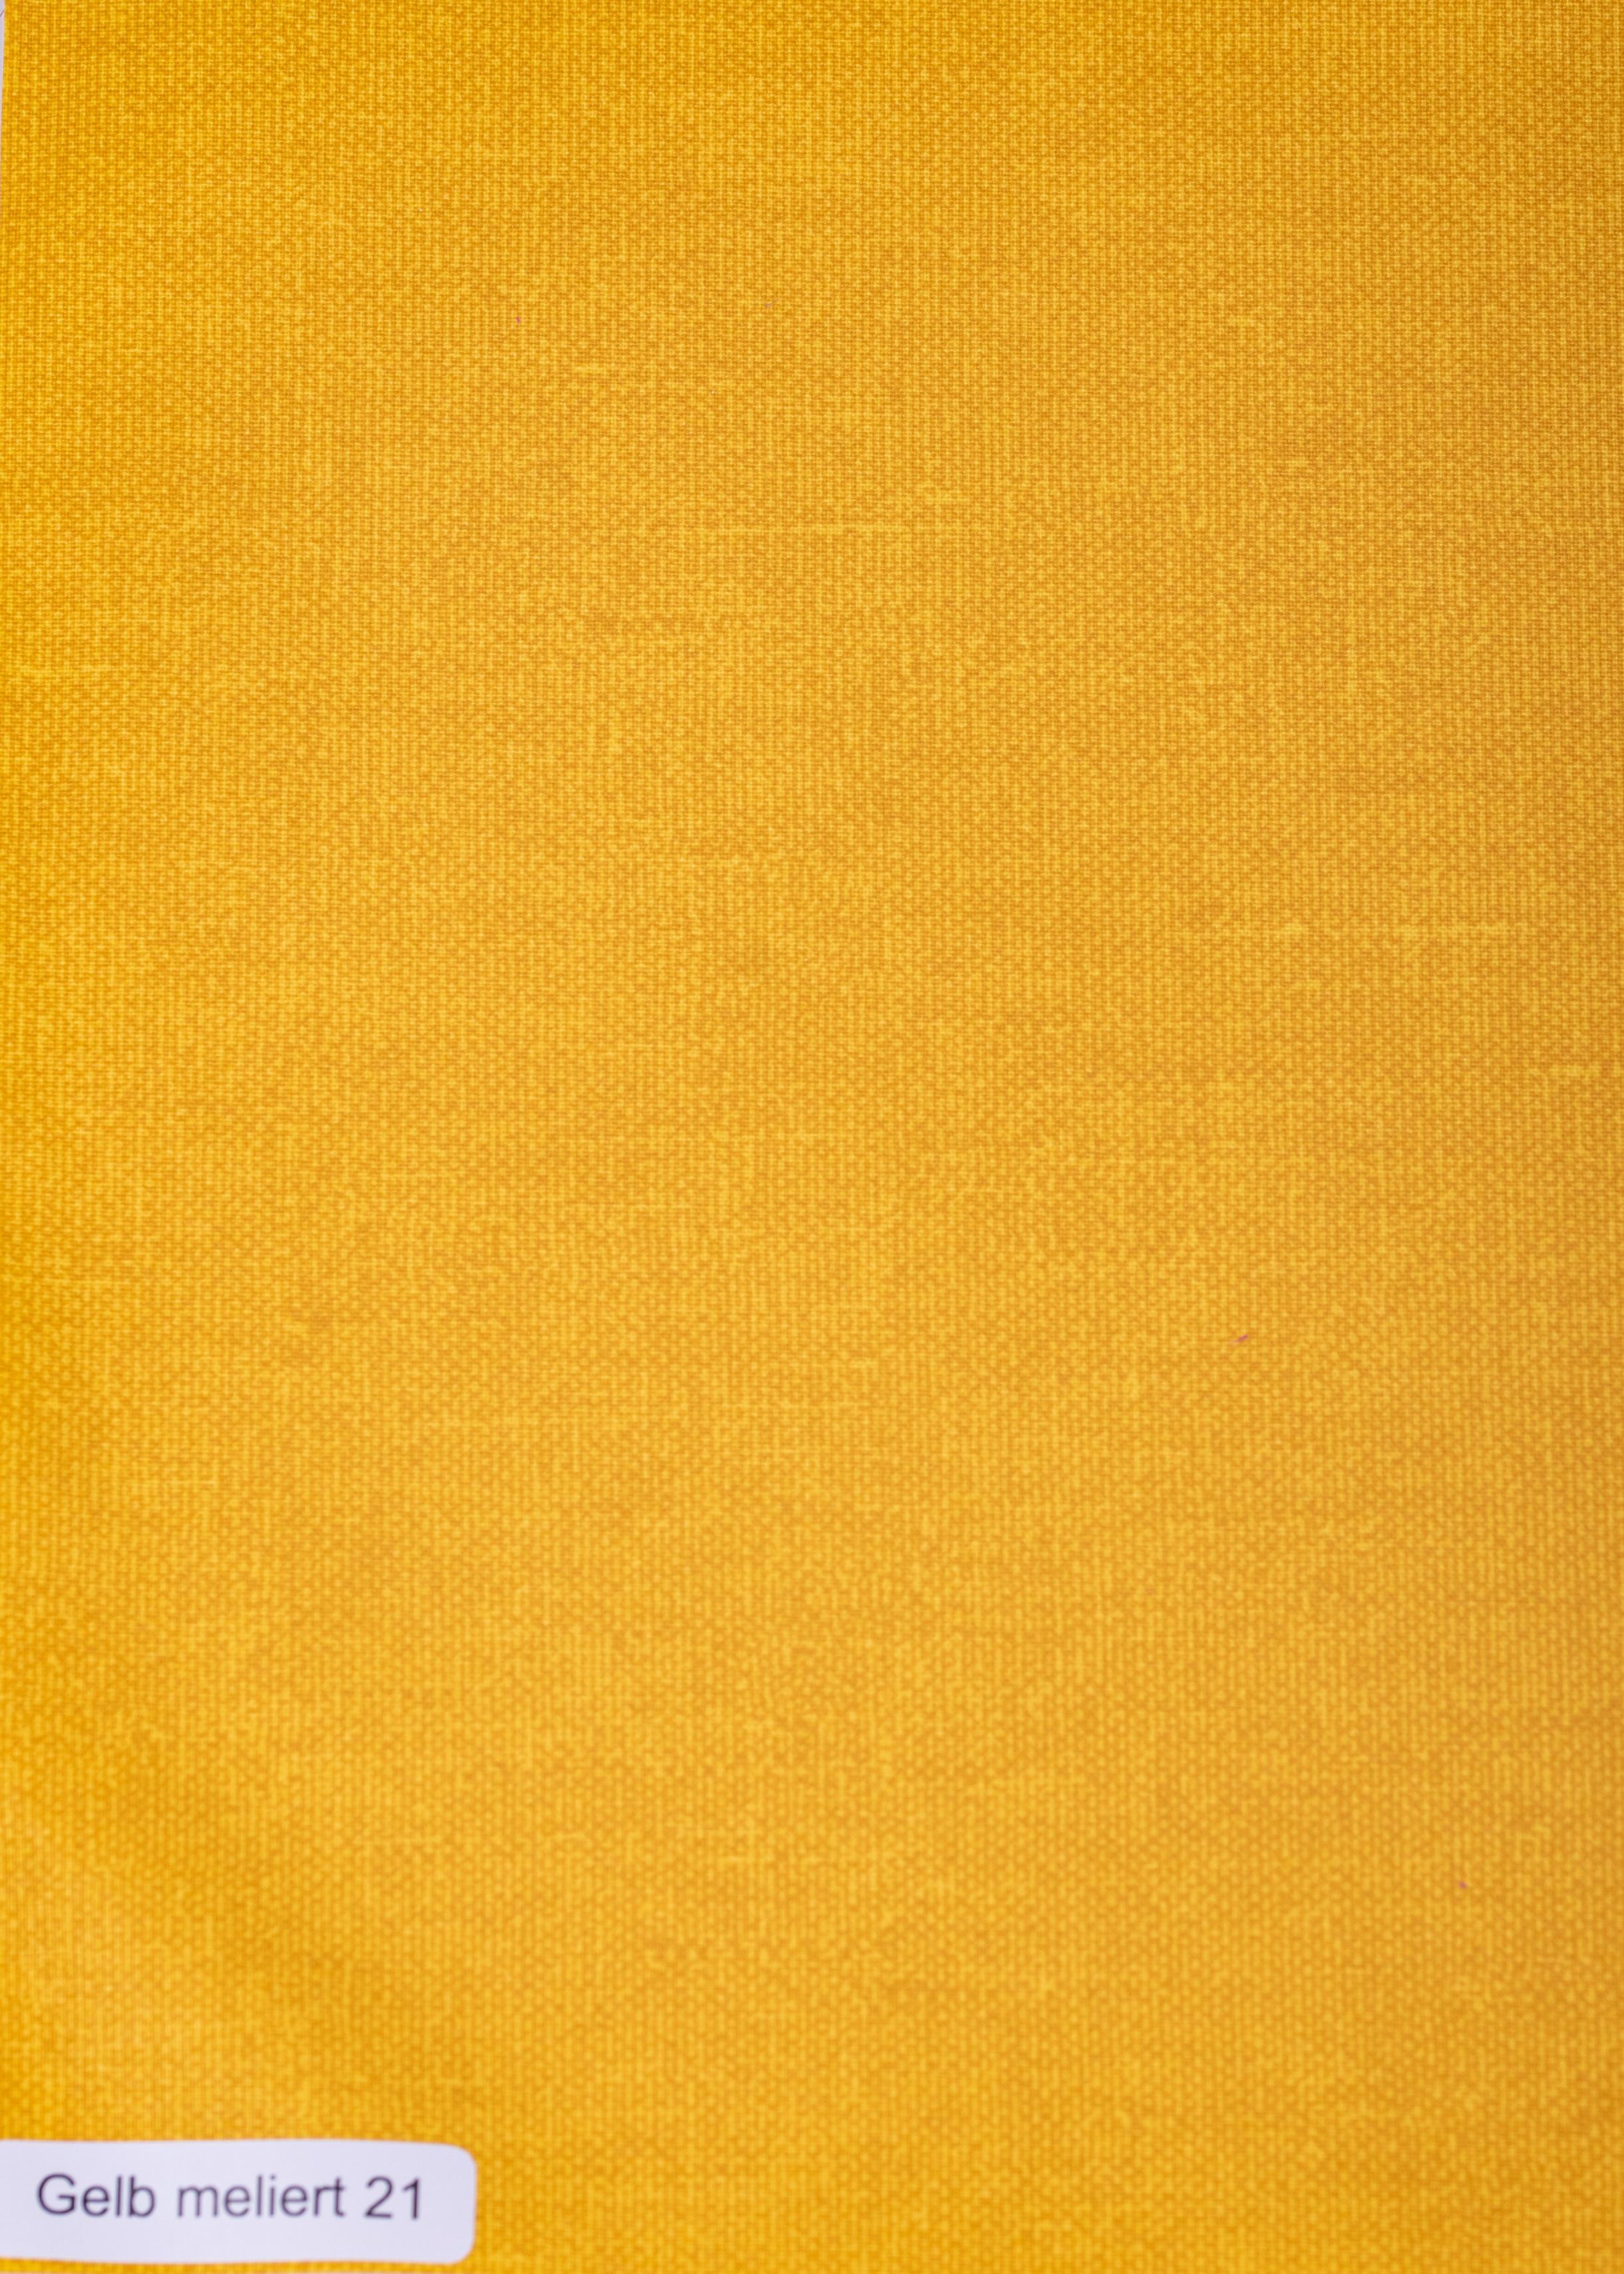 021-Gelb-meliert-21